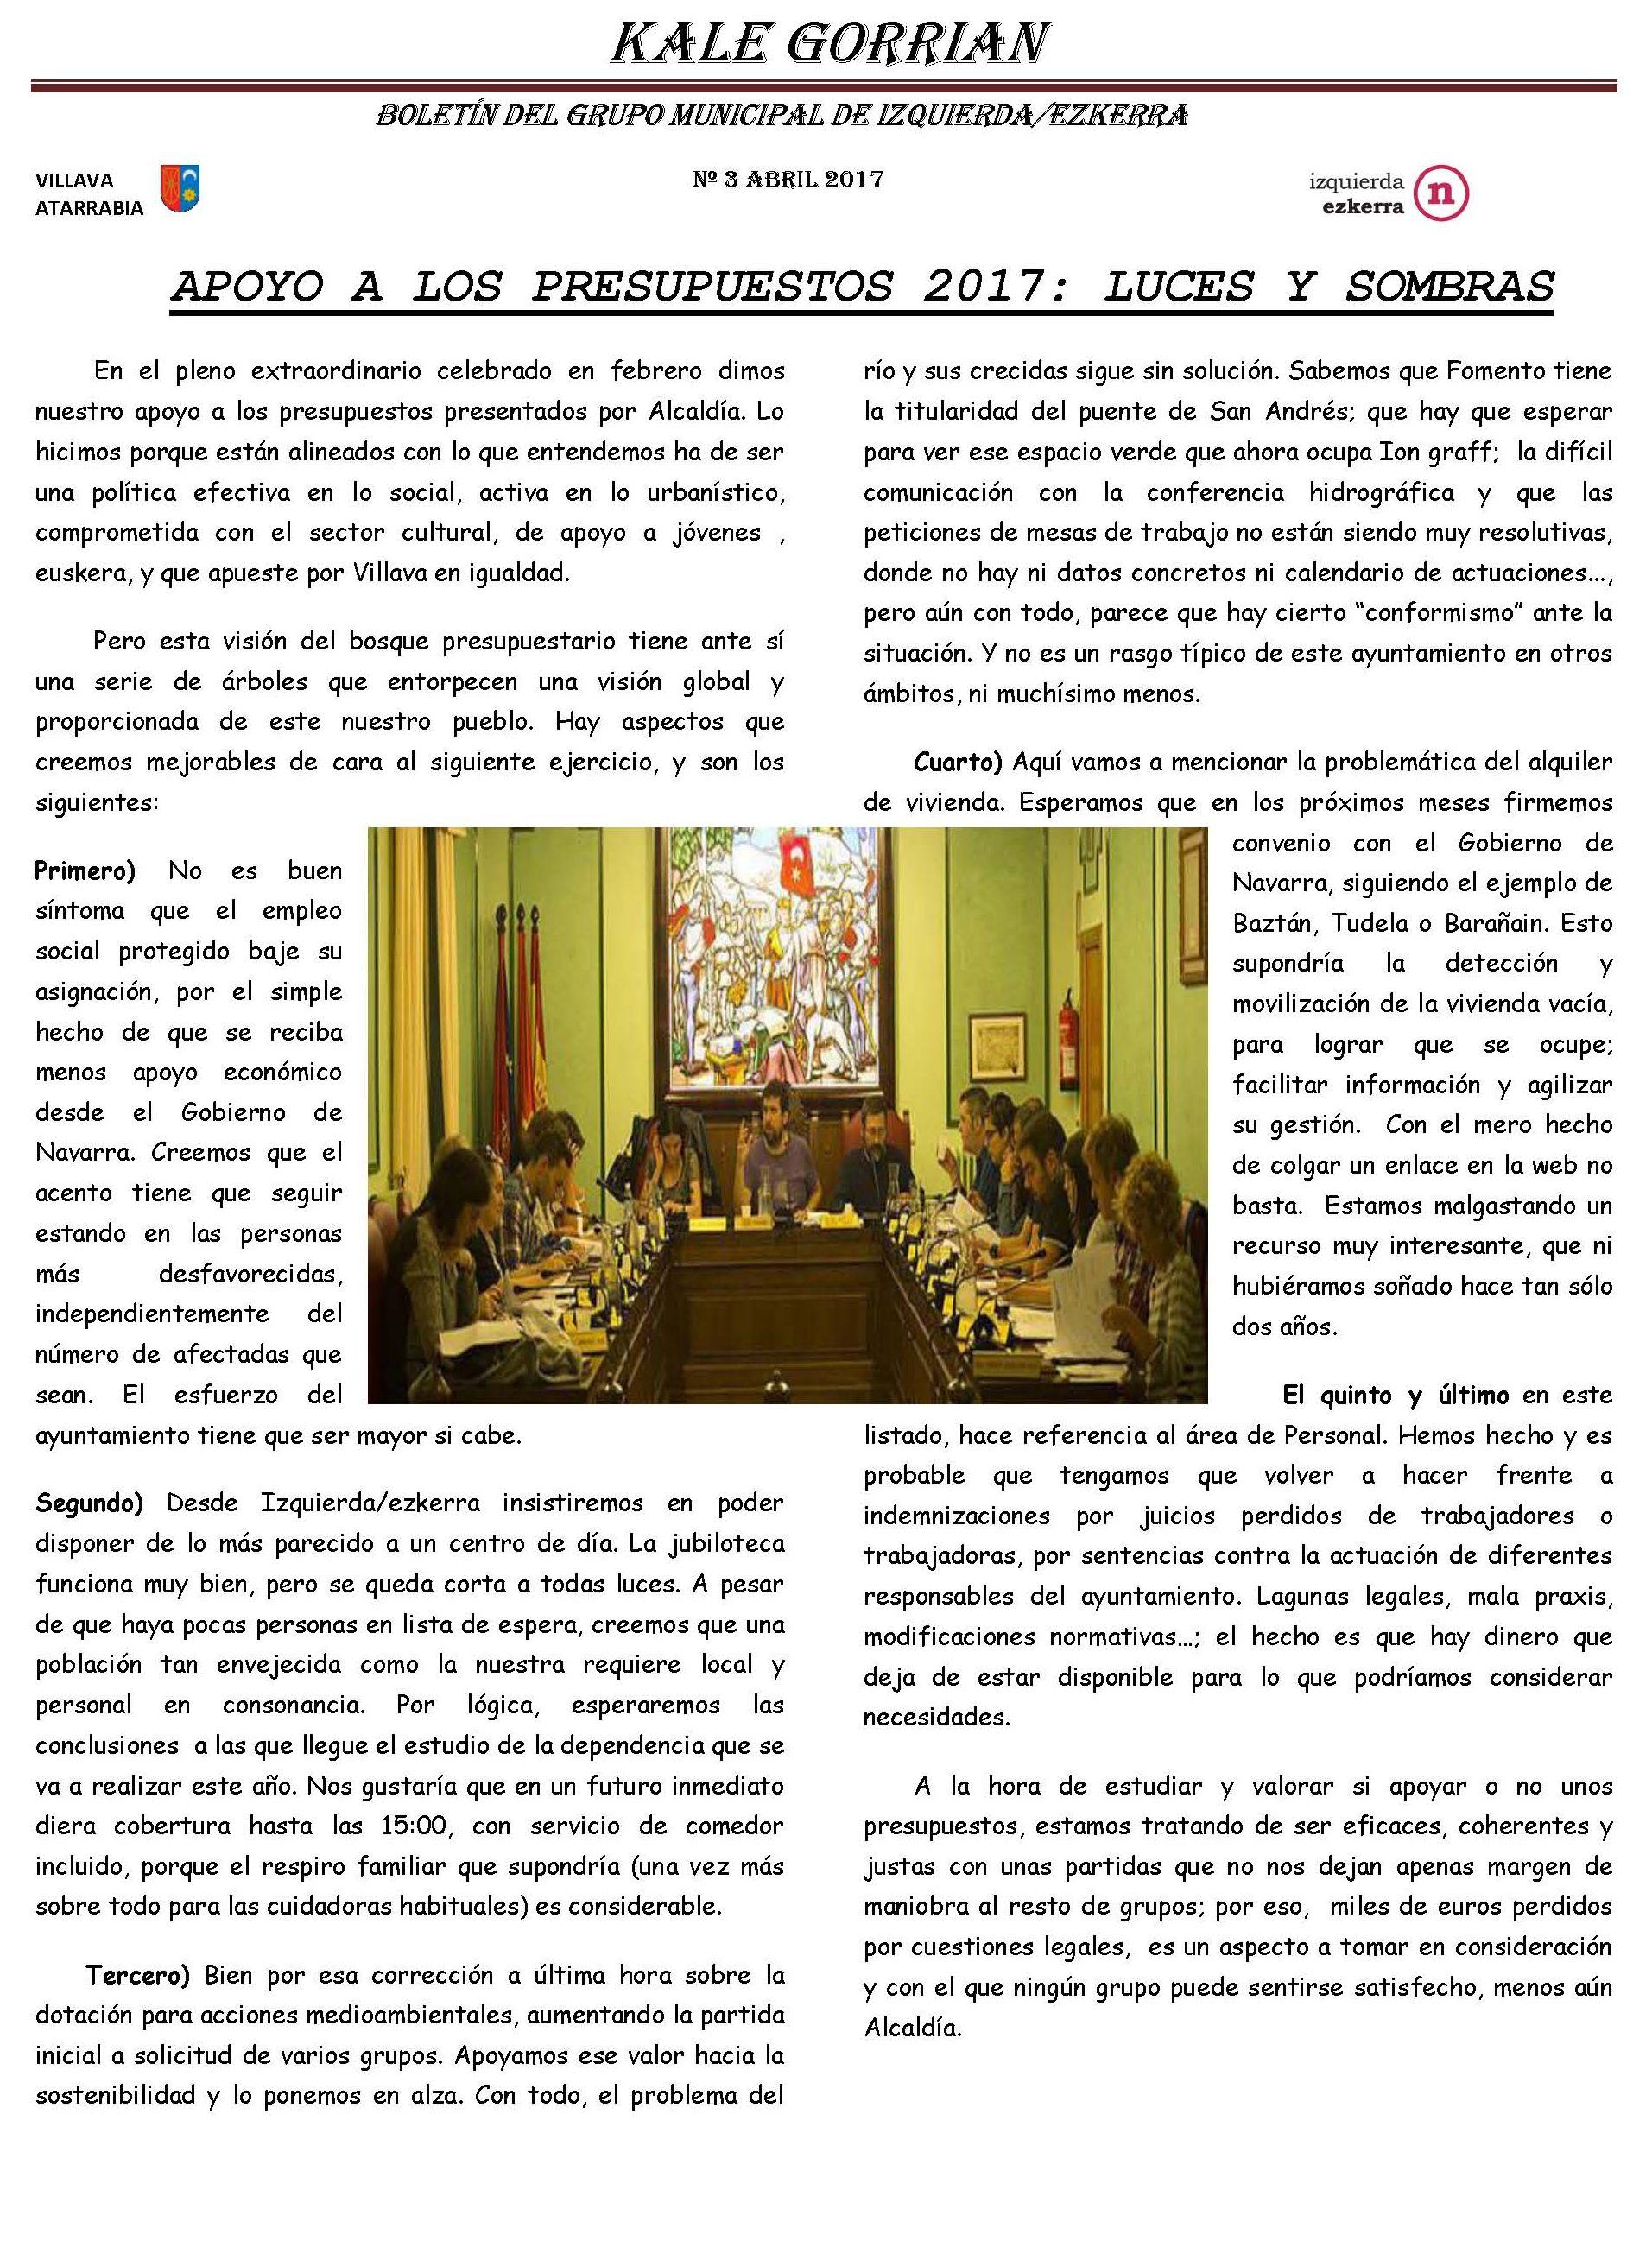 Boletín Informativo del grupo Izquierda Ezkerra Villava-Atarrabia. 1º Semestre 2017